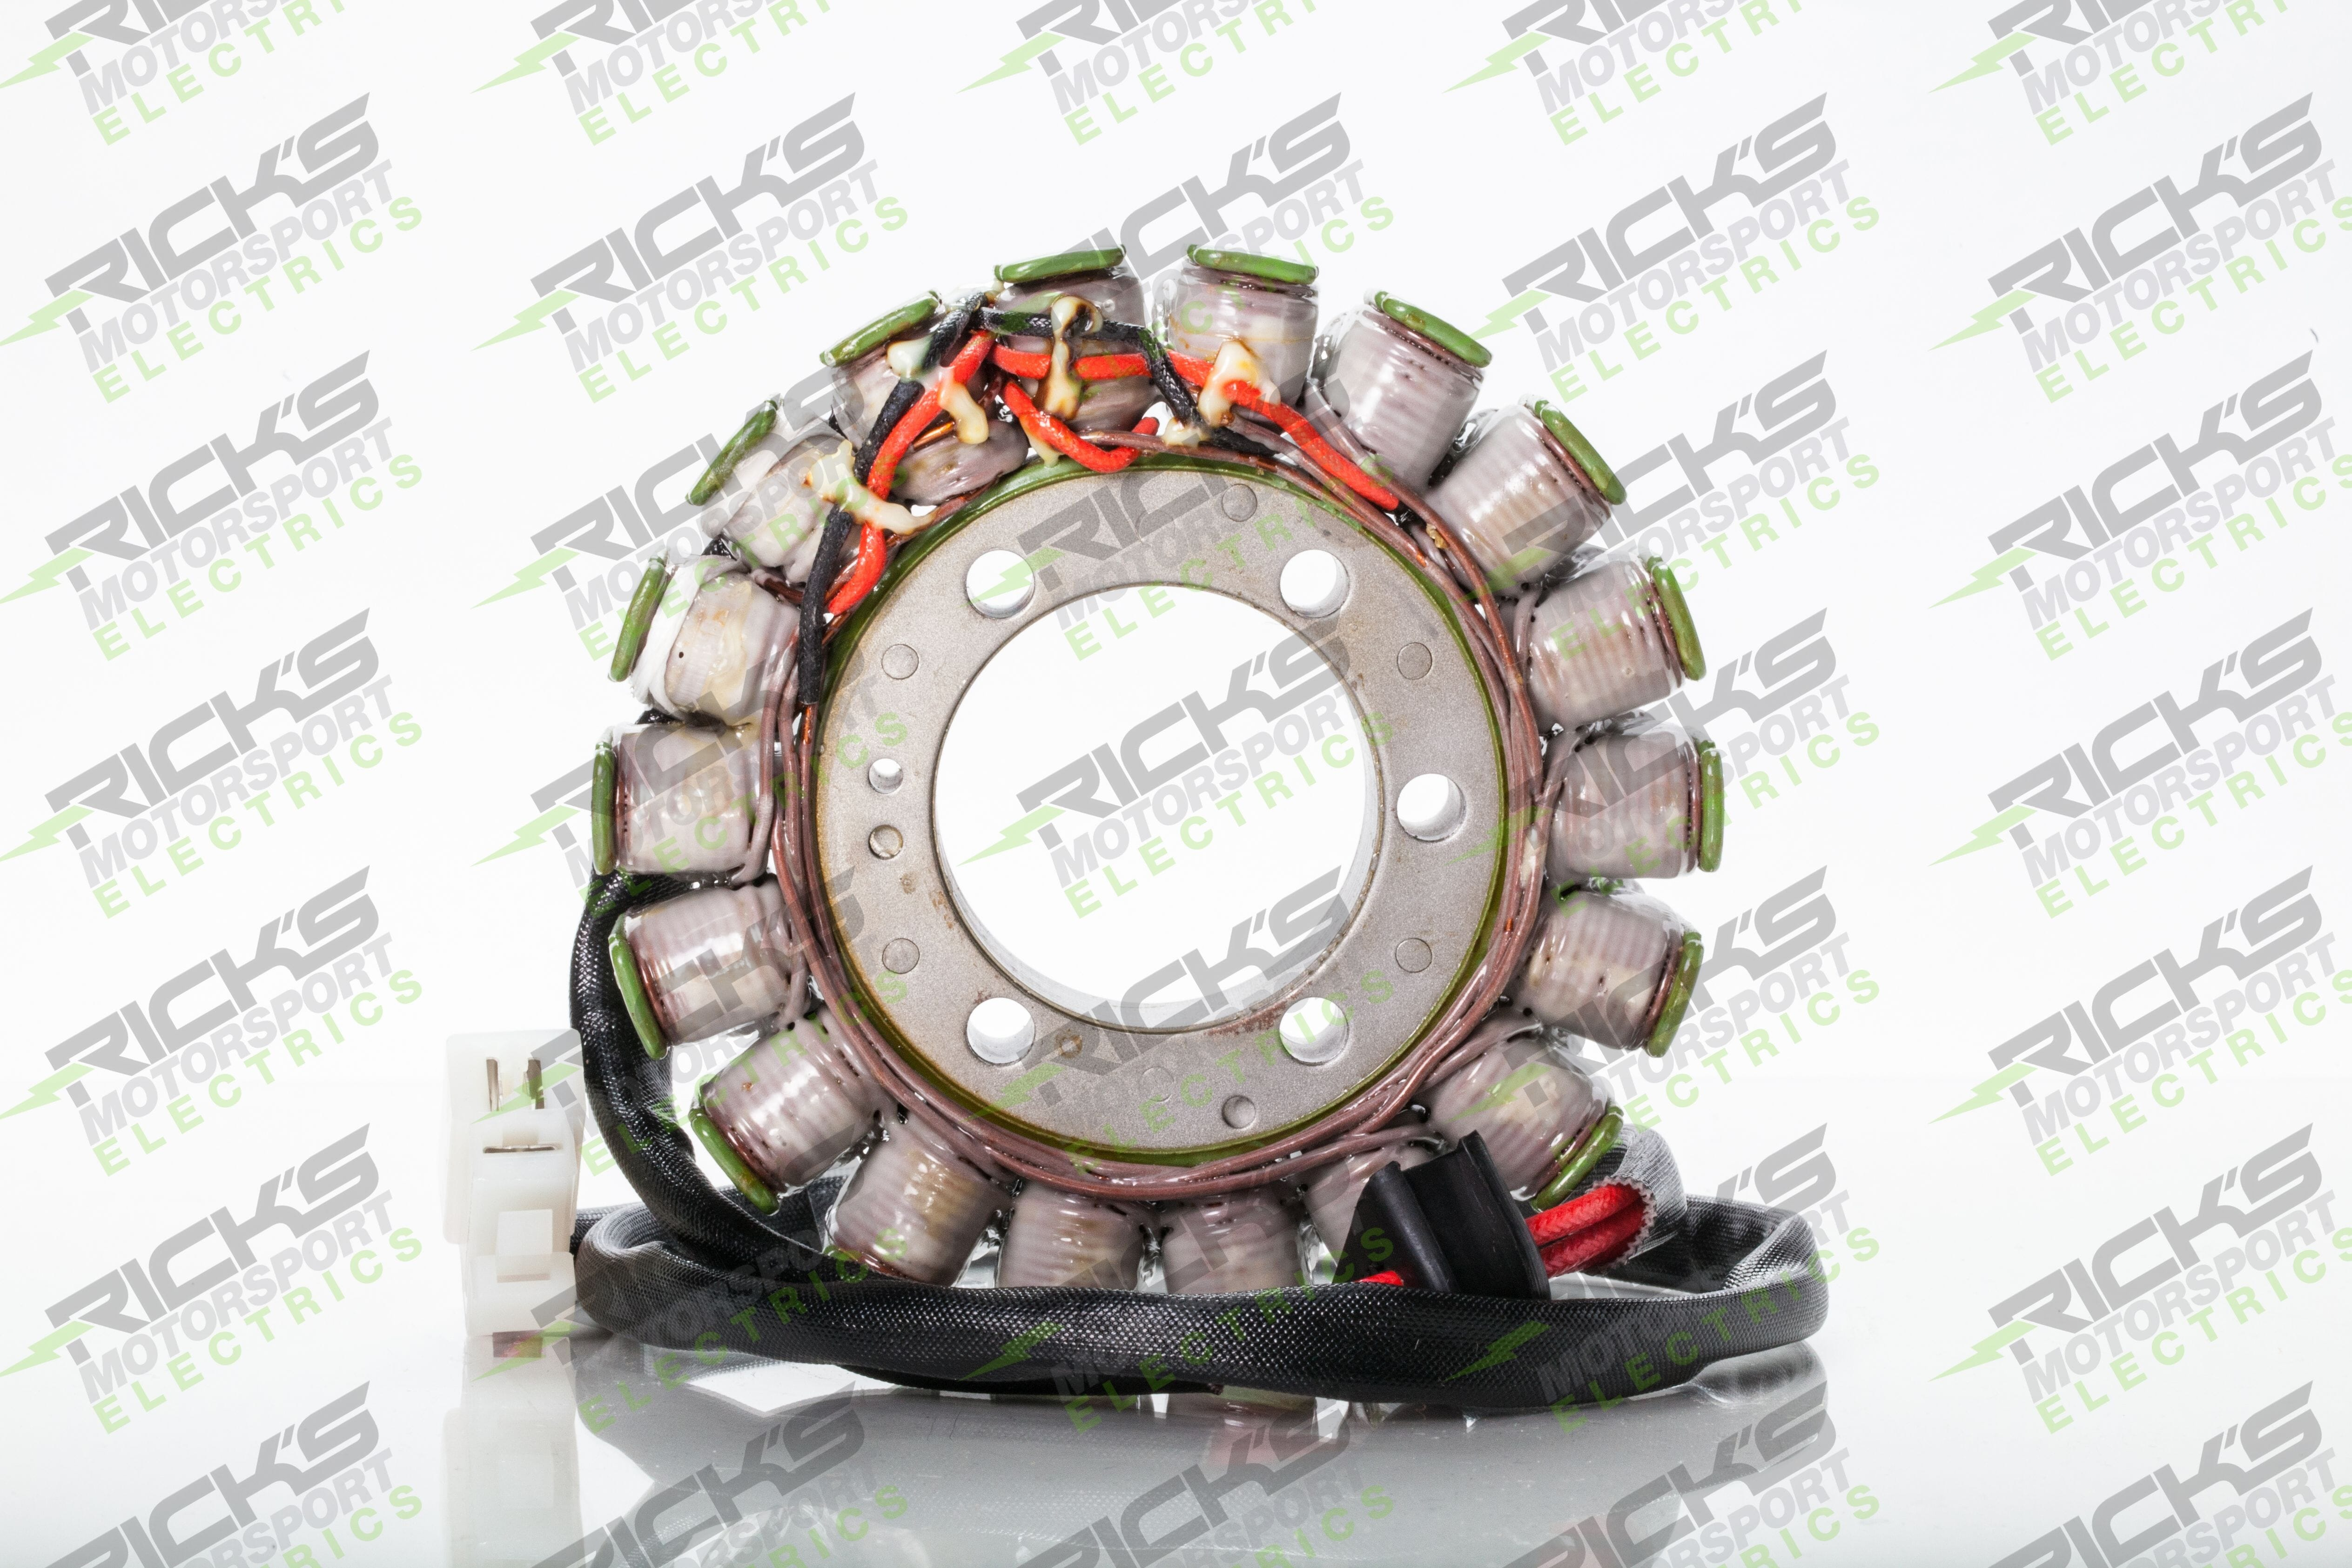 New OEM Style Ducati Stator 21_009